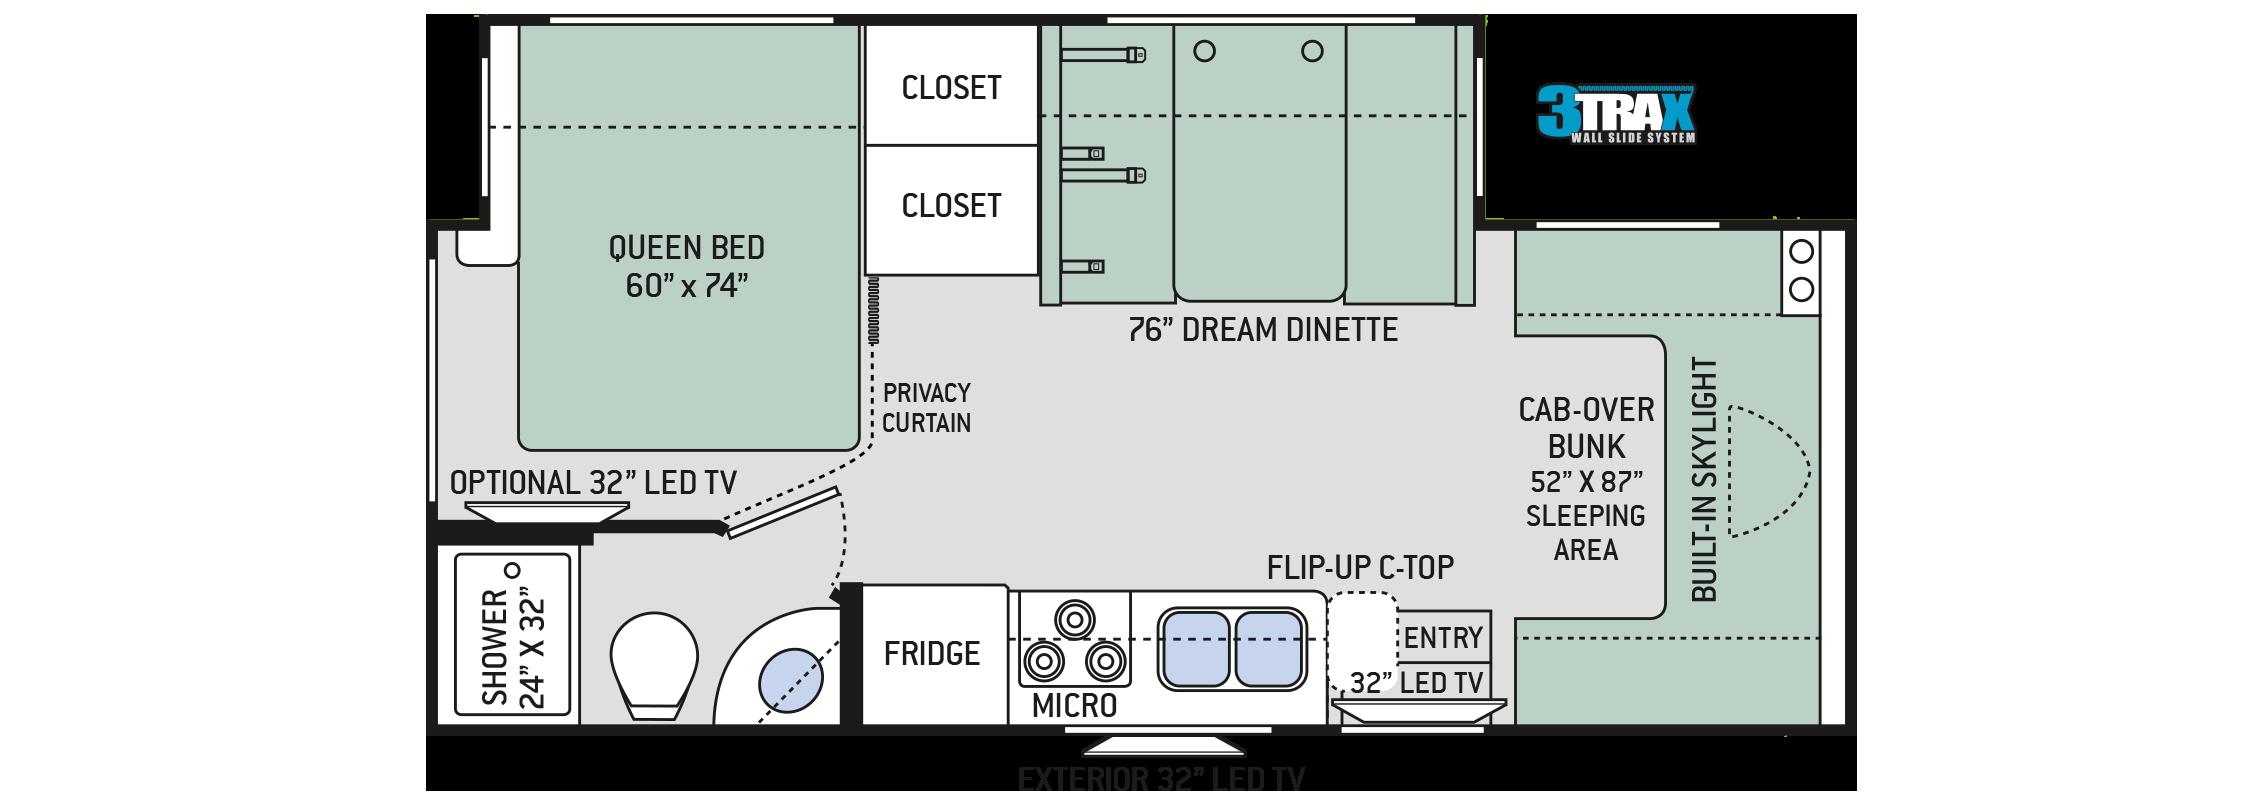 Floor plans quantum km24 for Floor plan plus